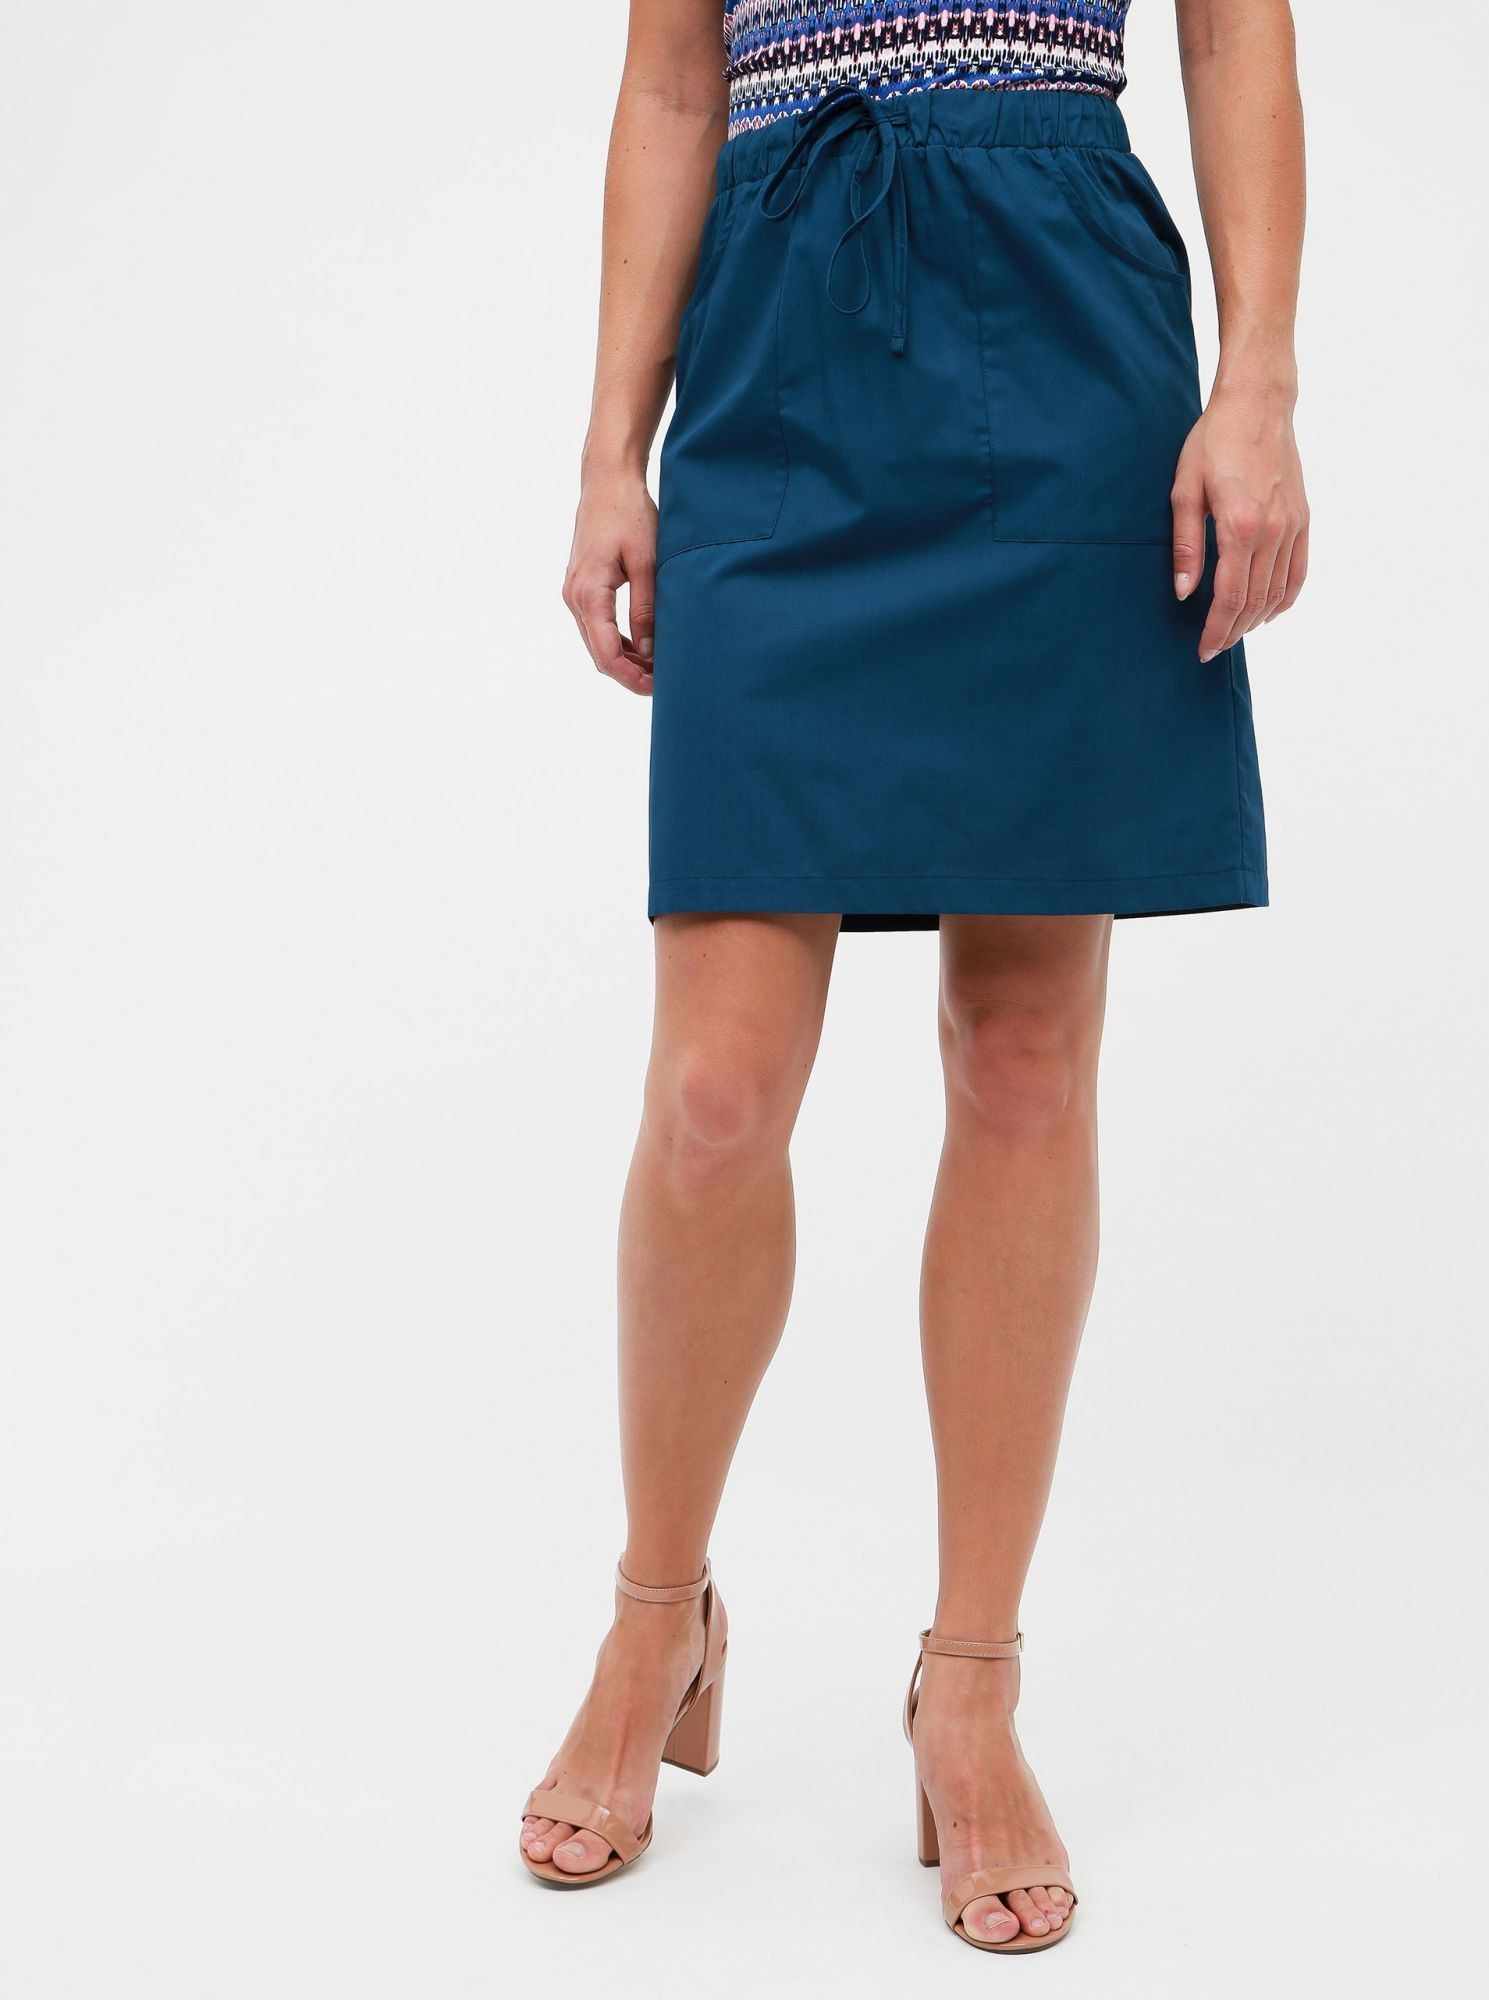 ZOOT oliwkowa spódnica damska Zoe